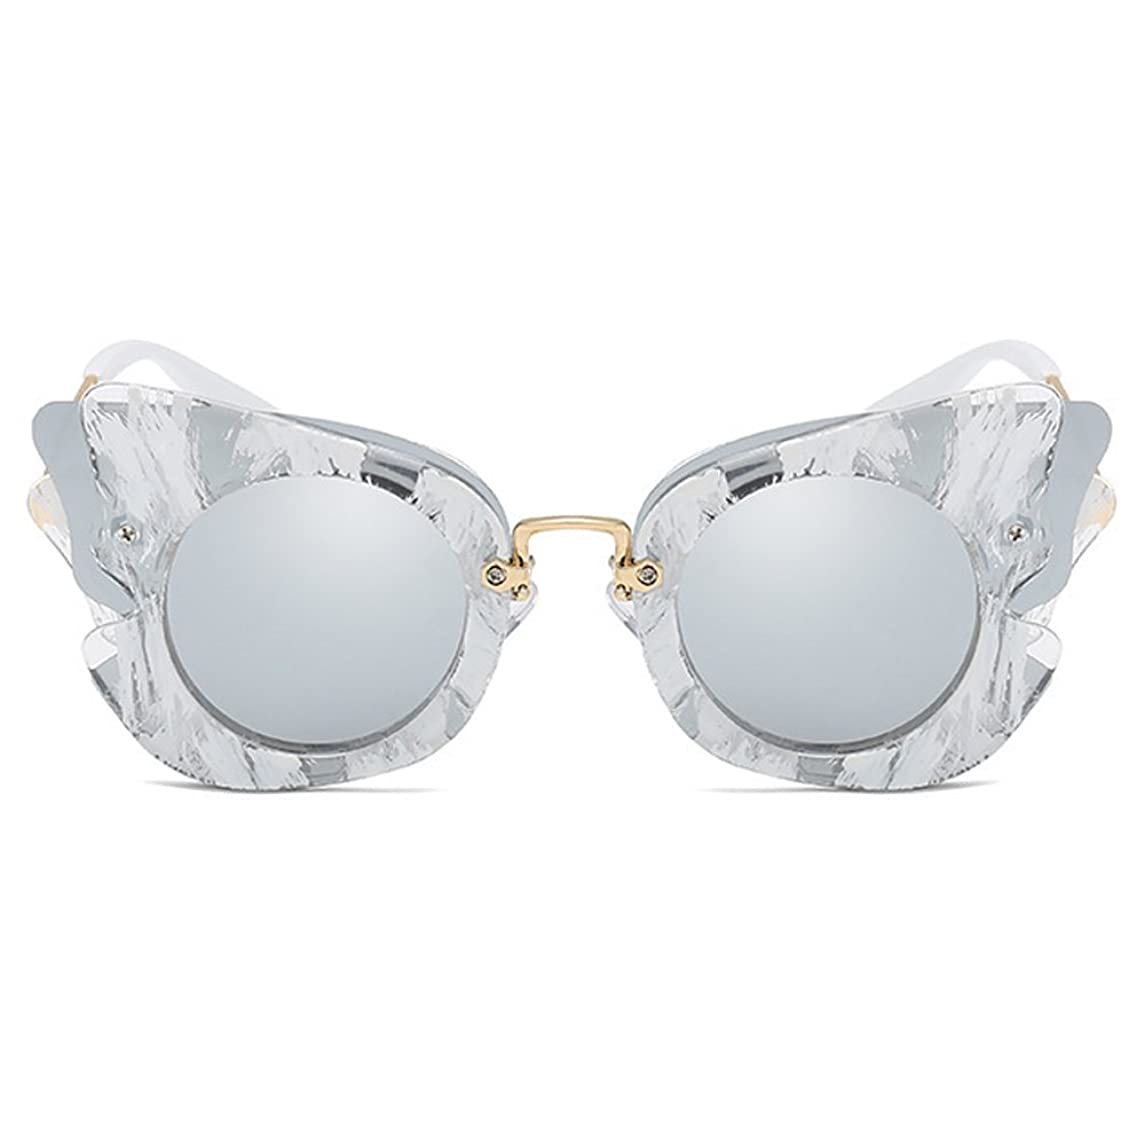 Fantia Girls Sunglasses Children Princess Polarized Eyeglass Wings Tourism